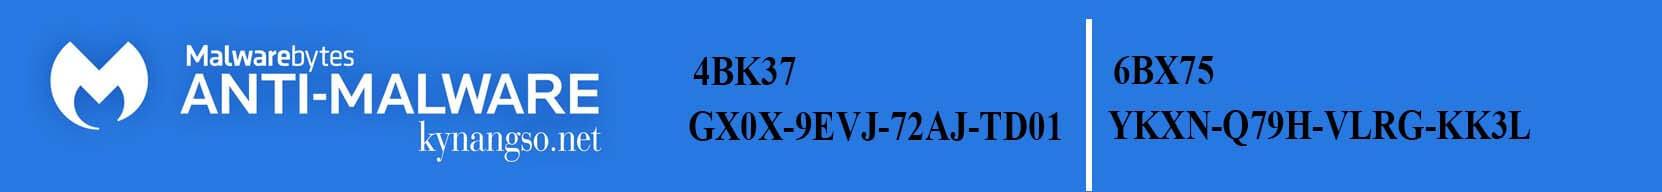 Antivirus Malwarebytes 2018 Ph%E1%BA%A7n m%E1%BB%81m di%E1%BB%87t virus v%C3%A0 Malware C%E1%BB%B1c hi%E1%BB%87u qu%E1%BA%A31 - Antivirus Malwarebytes 2018 - Phần mềm diệt virus và Malware Cực hiệu quả (Full KEY 18/10/2018)